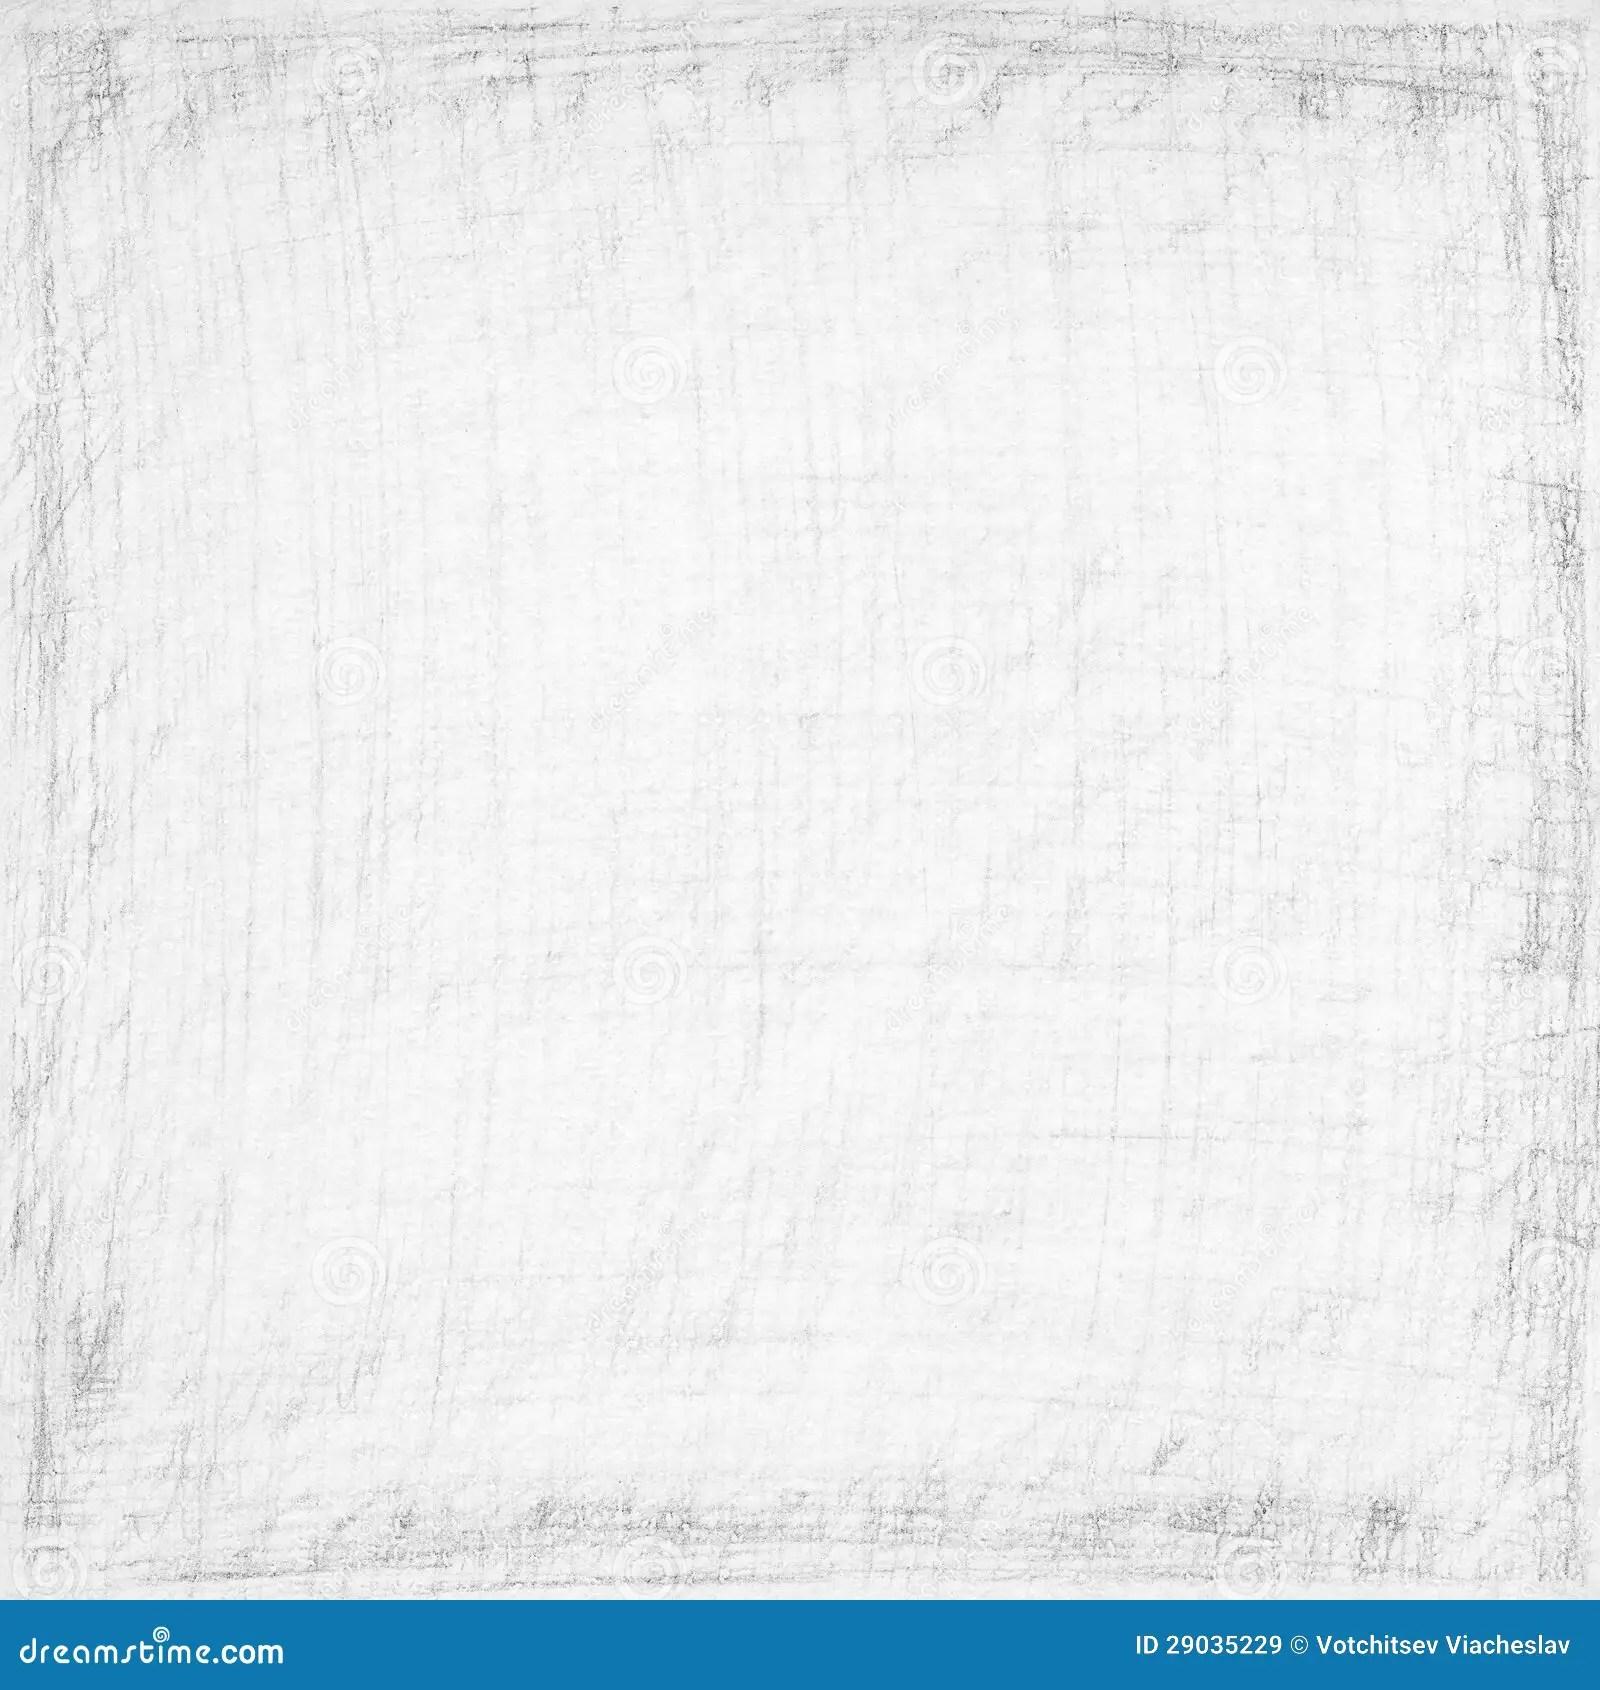 Sketch Paper Background Stock Image Image Of Frame